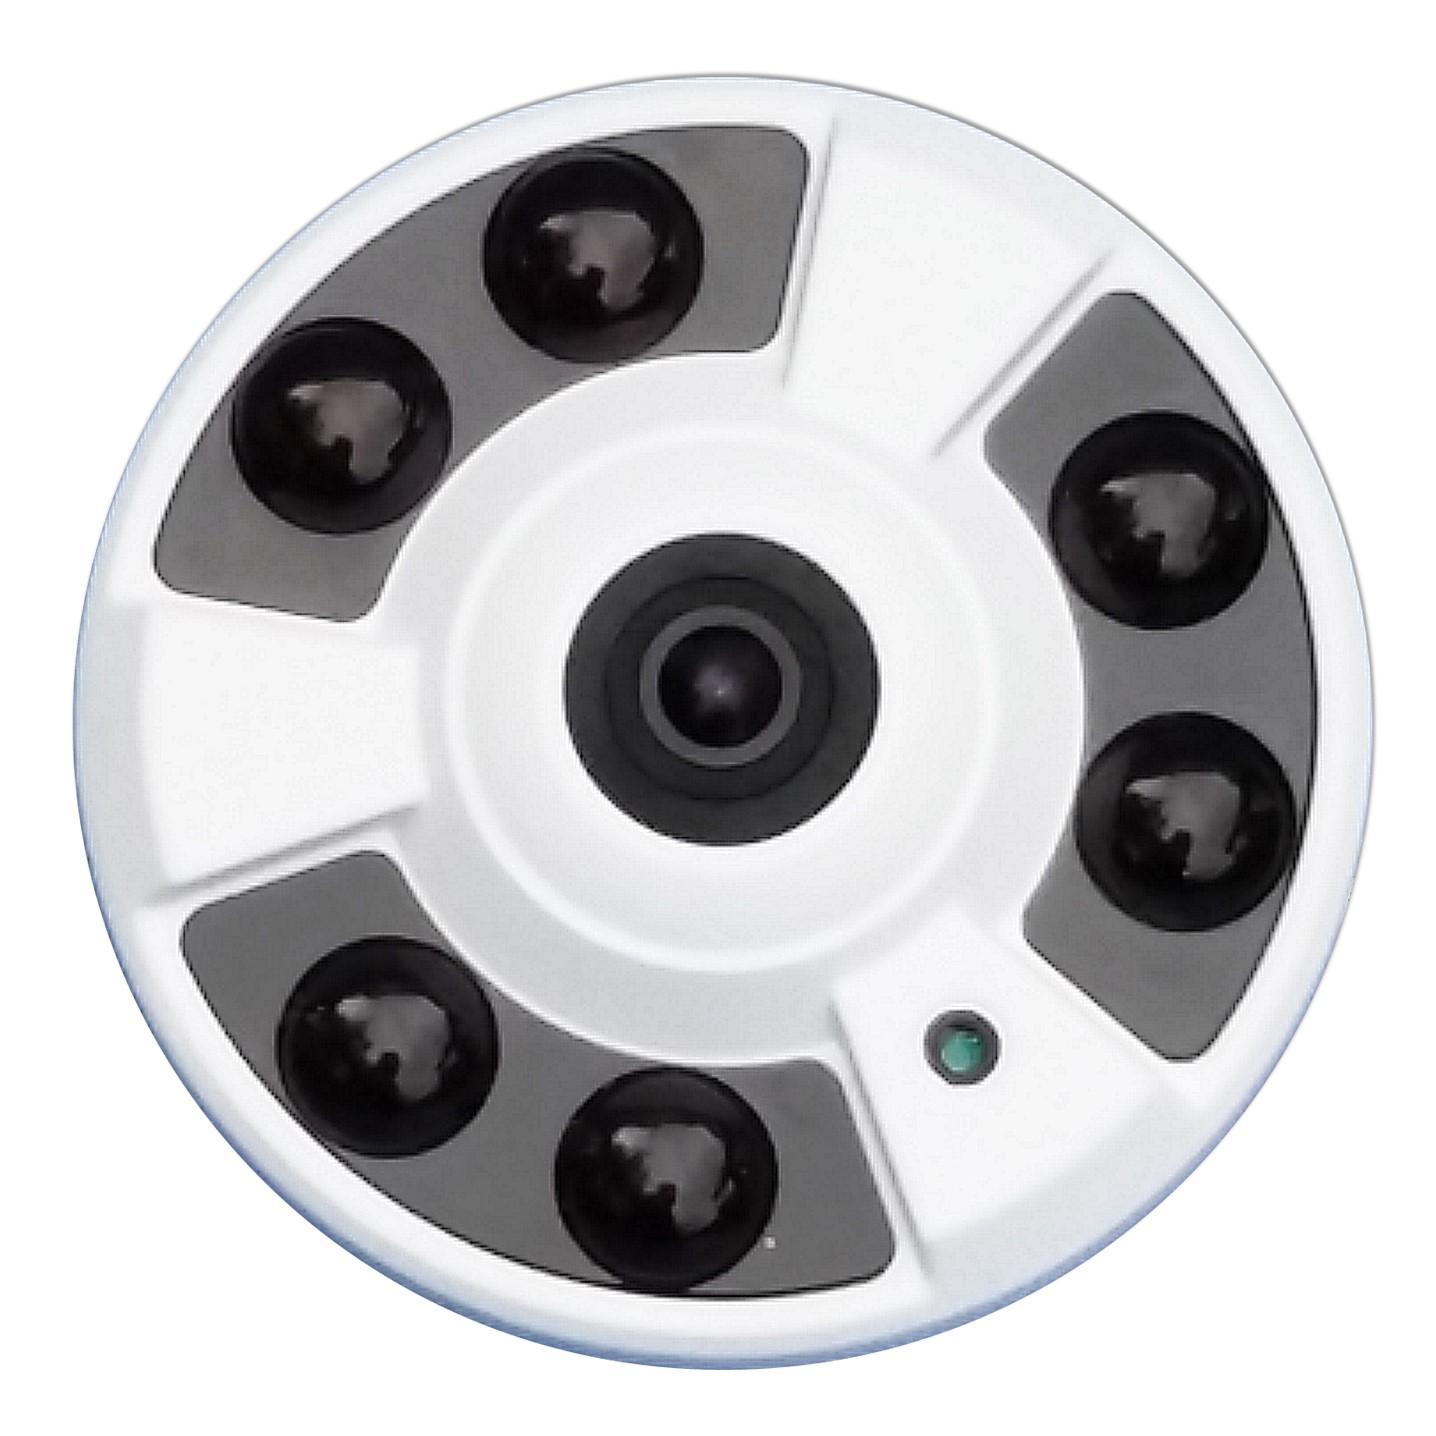 Megapixel Dome Infrarot Kamera Nachtsichtkamera Überwachungskamera Infrarotkamera mit Top Bildsensor